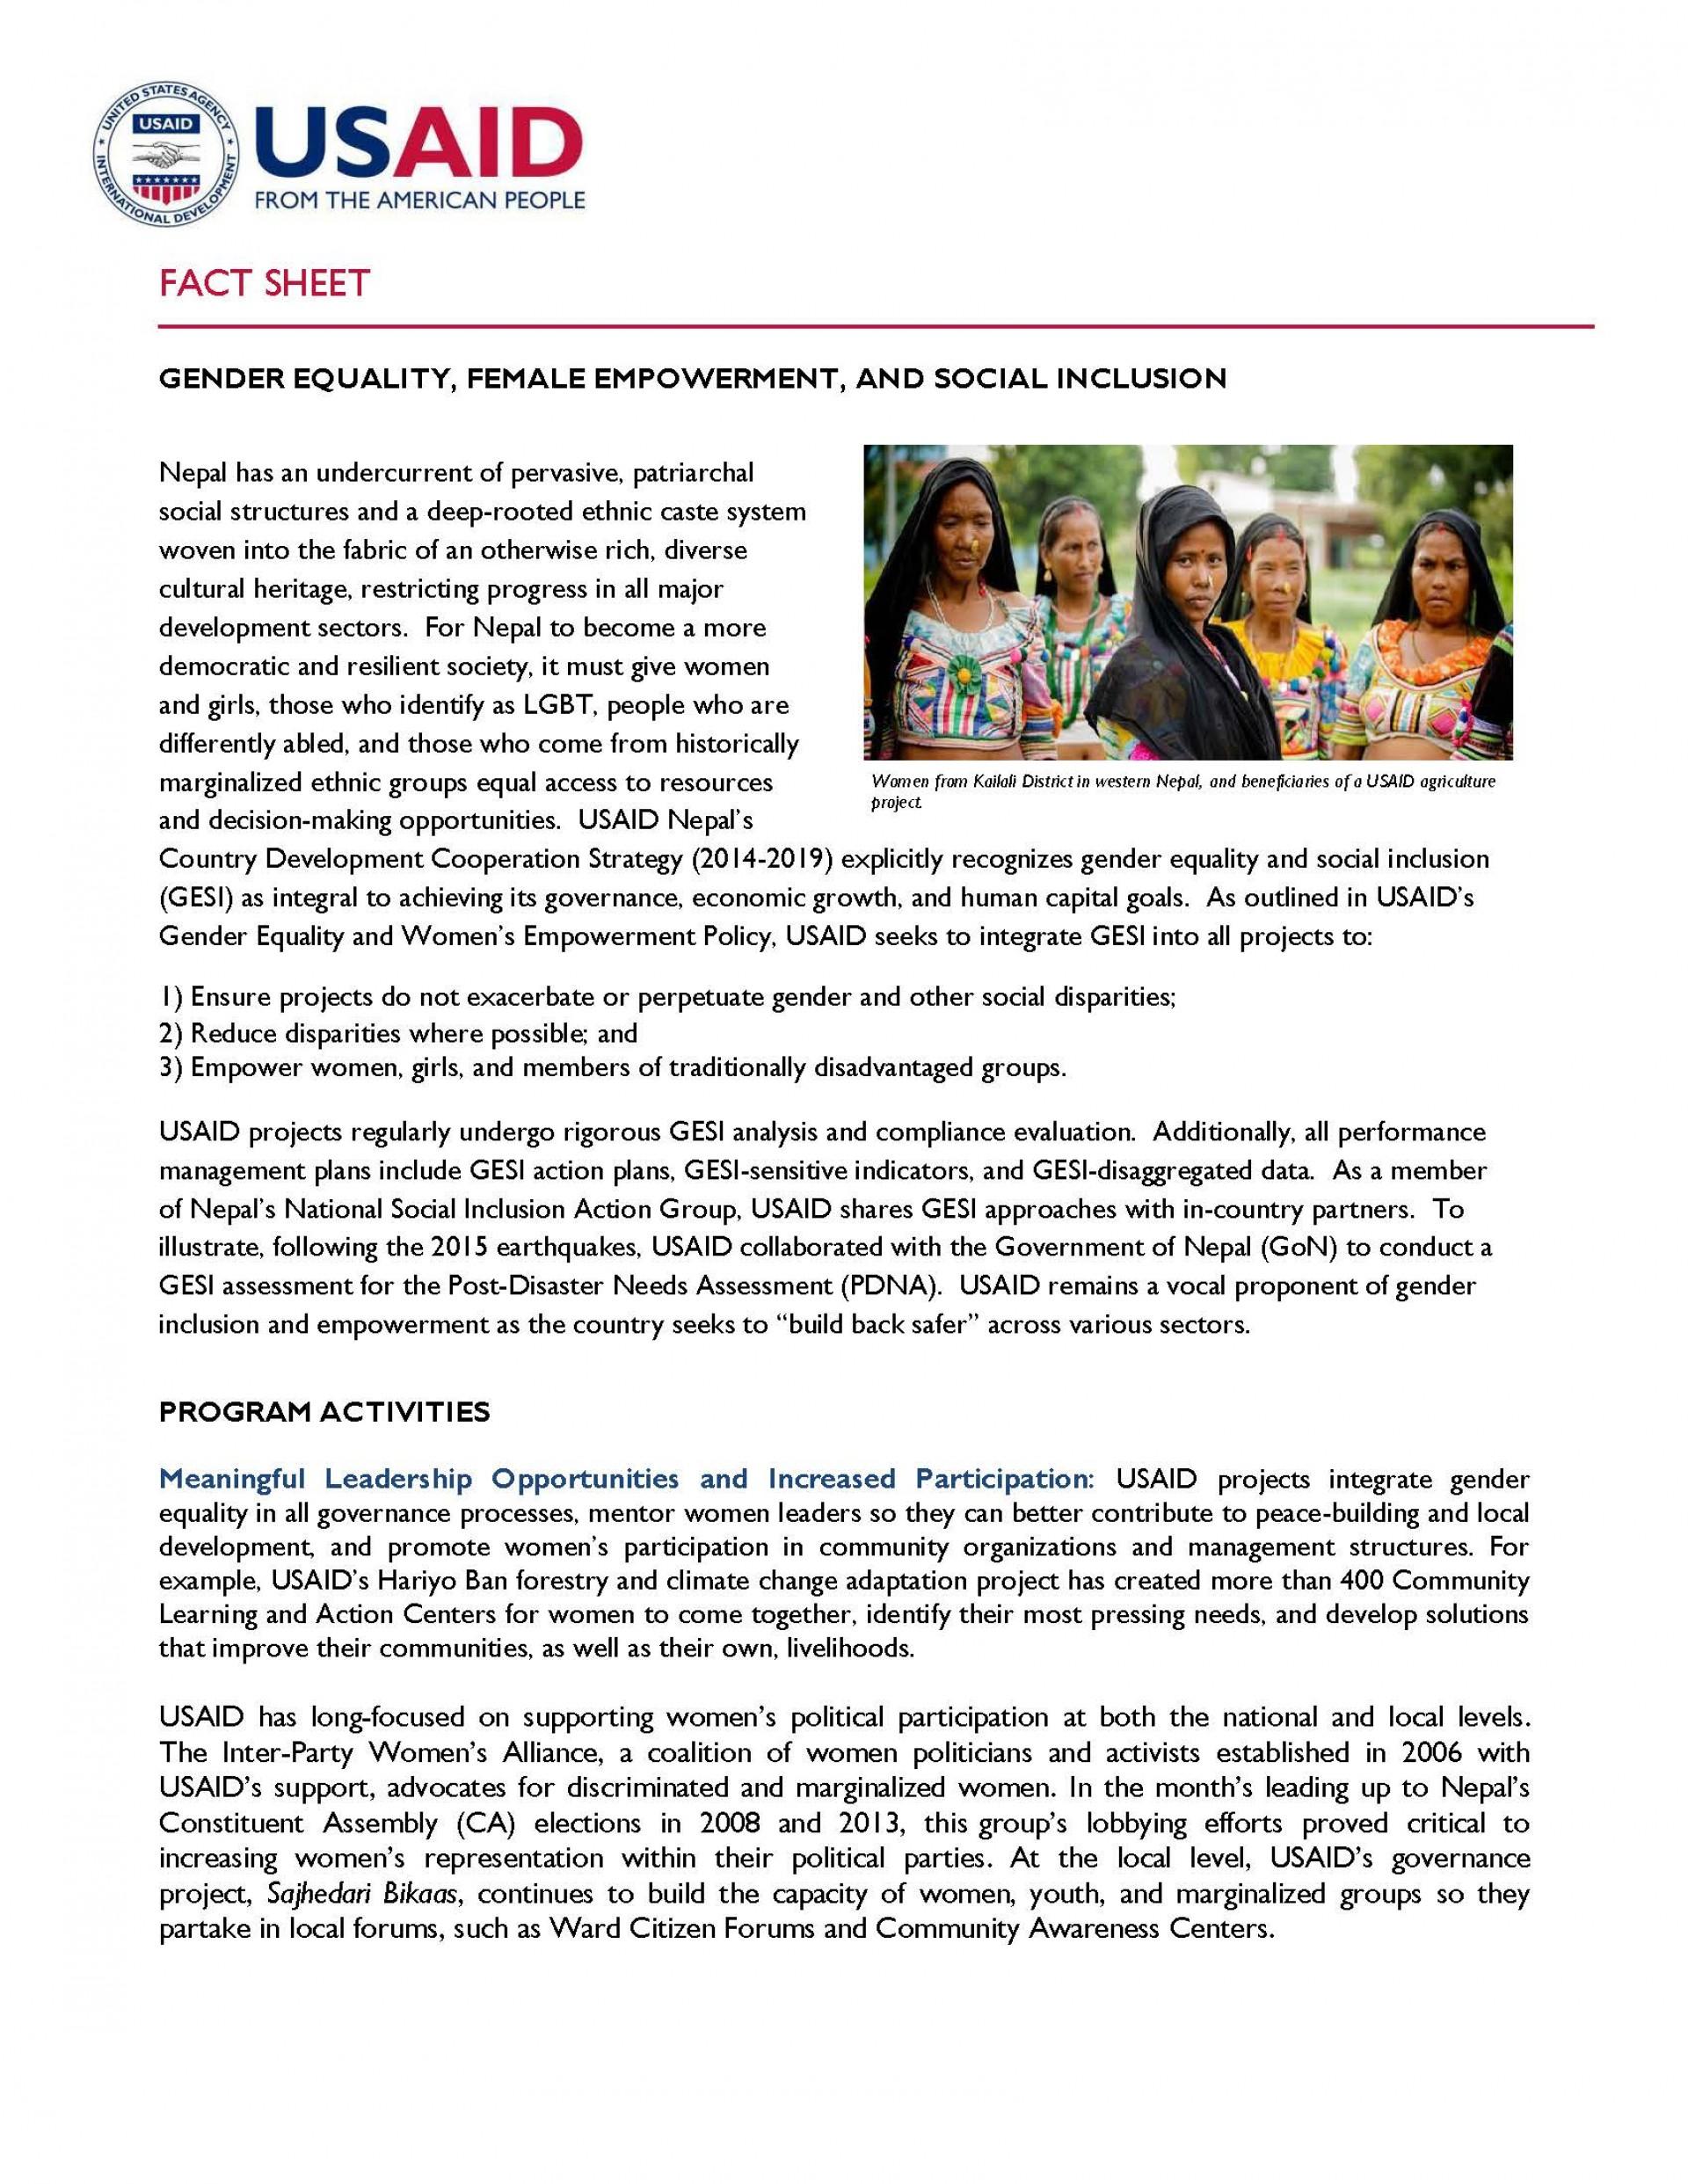 001 Essay On Gender Discrimination In Nepal Final Gesi Factsheet Page 1 2 Incredible 1920